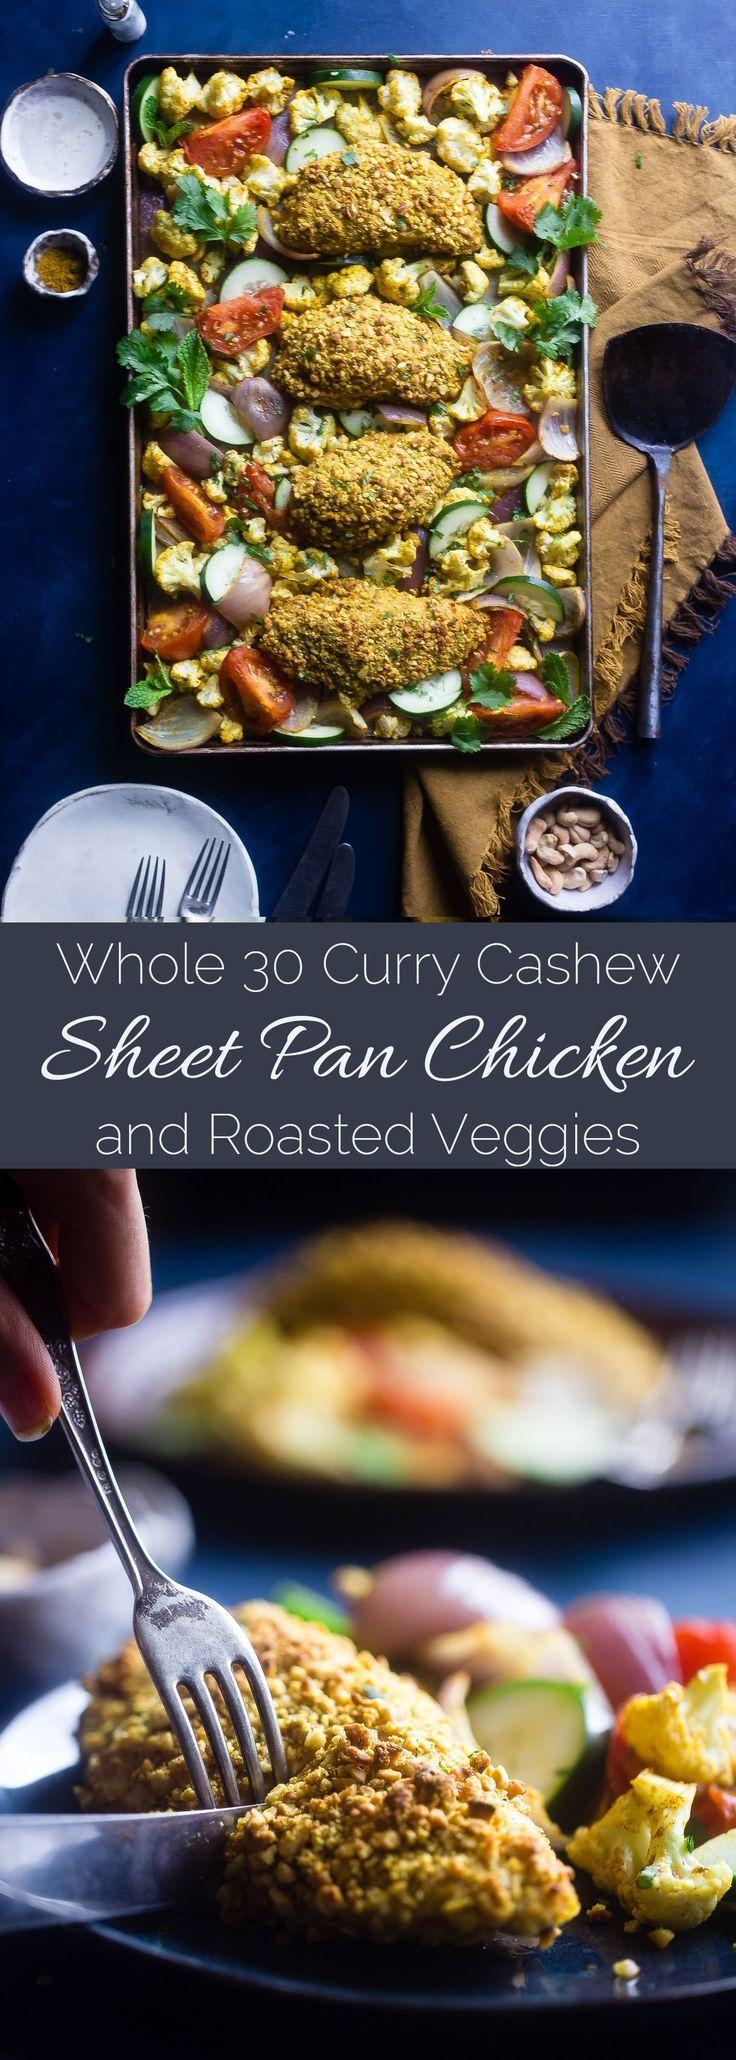 Easy Healthy Cashew Chicken Sheet Pan Dinner | Food Faith Fitness